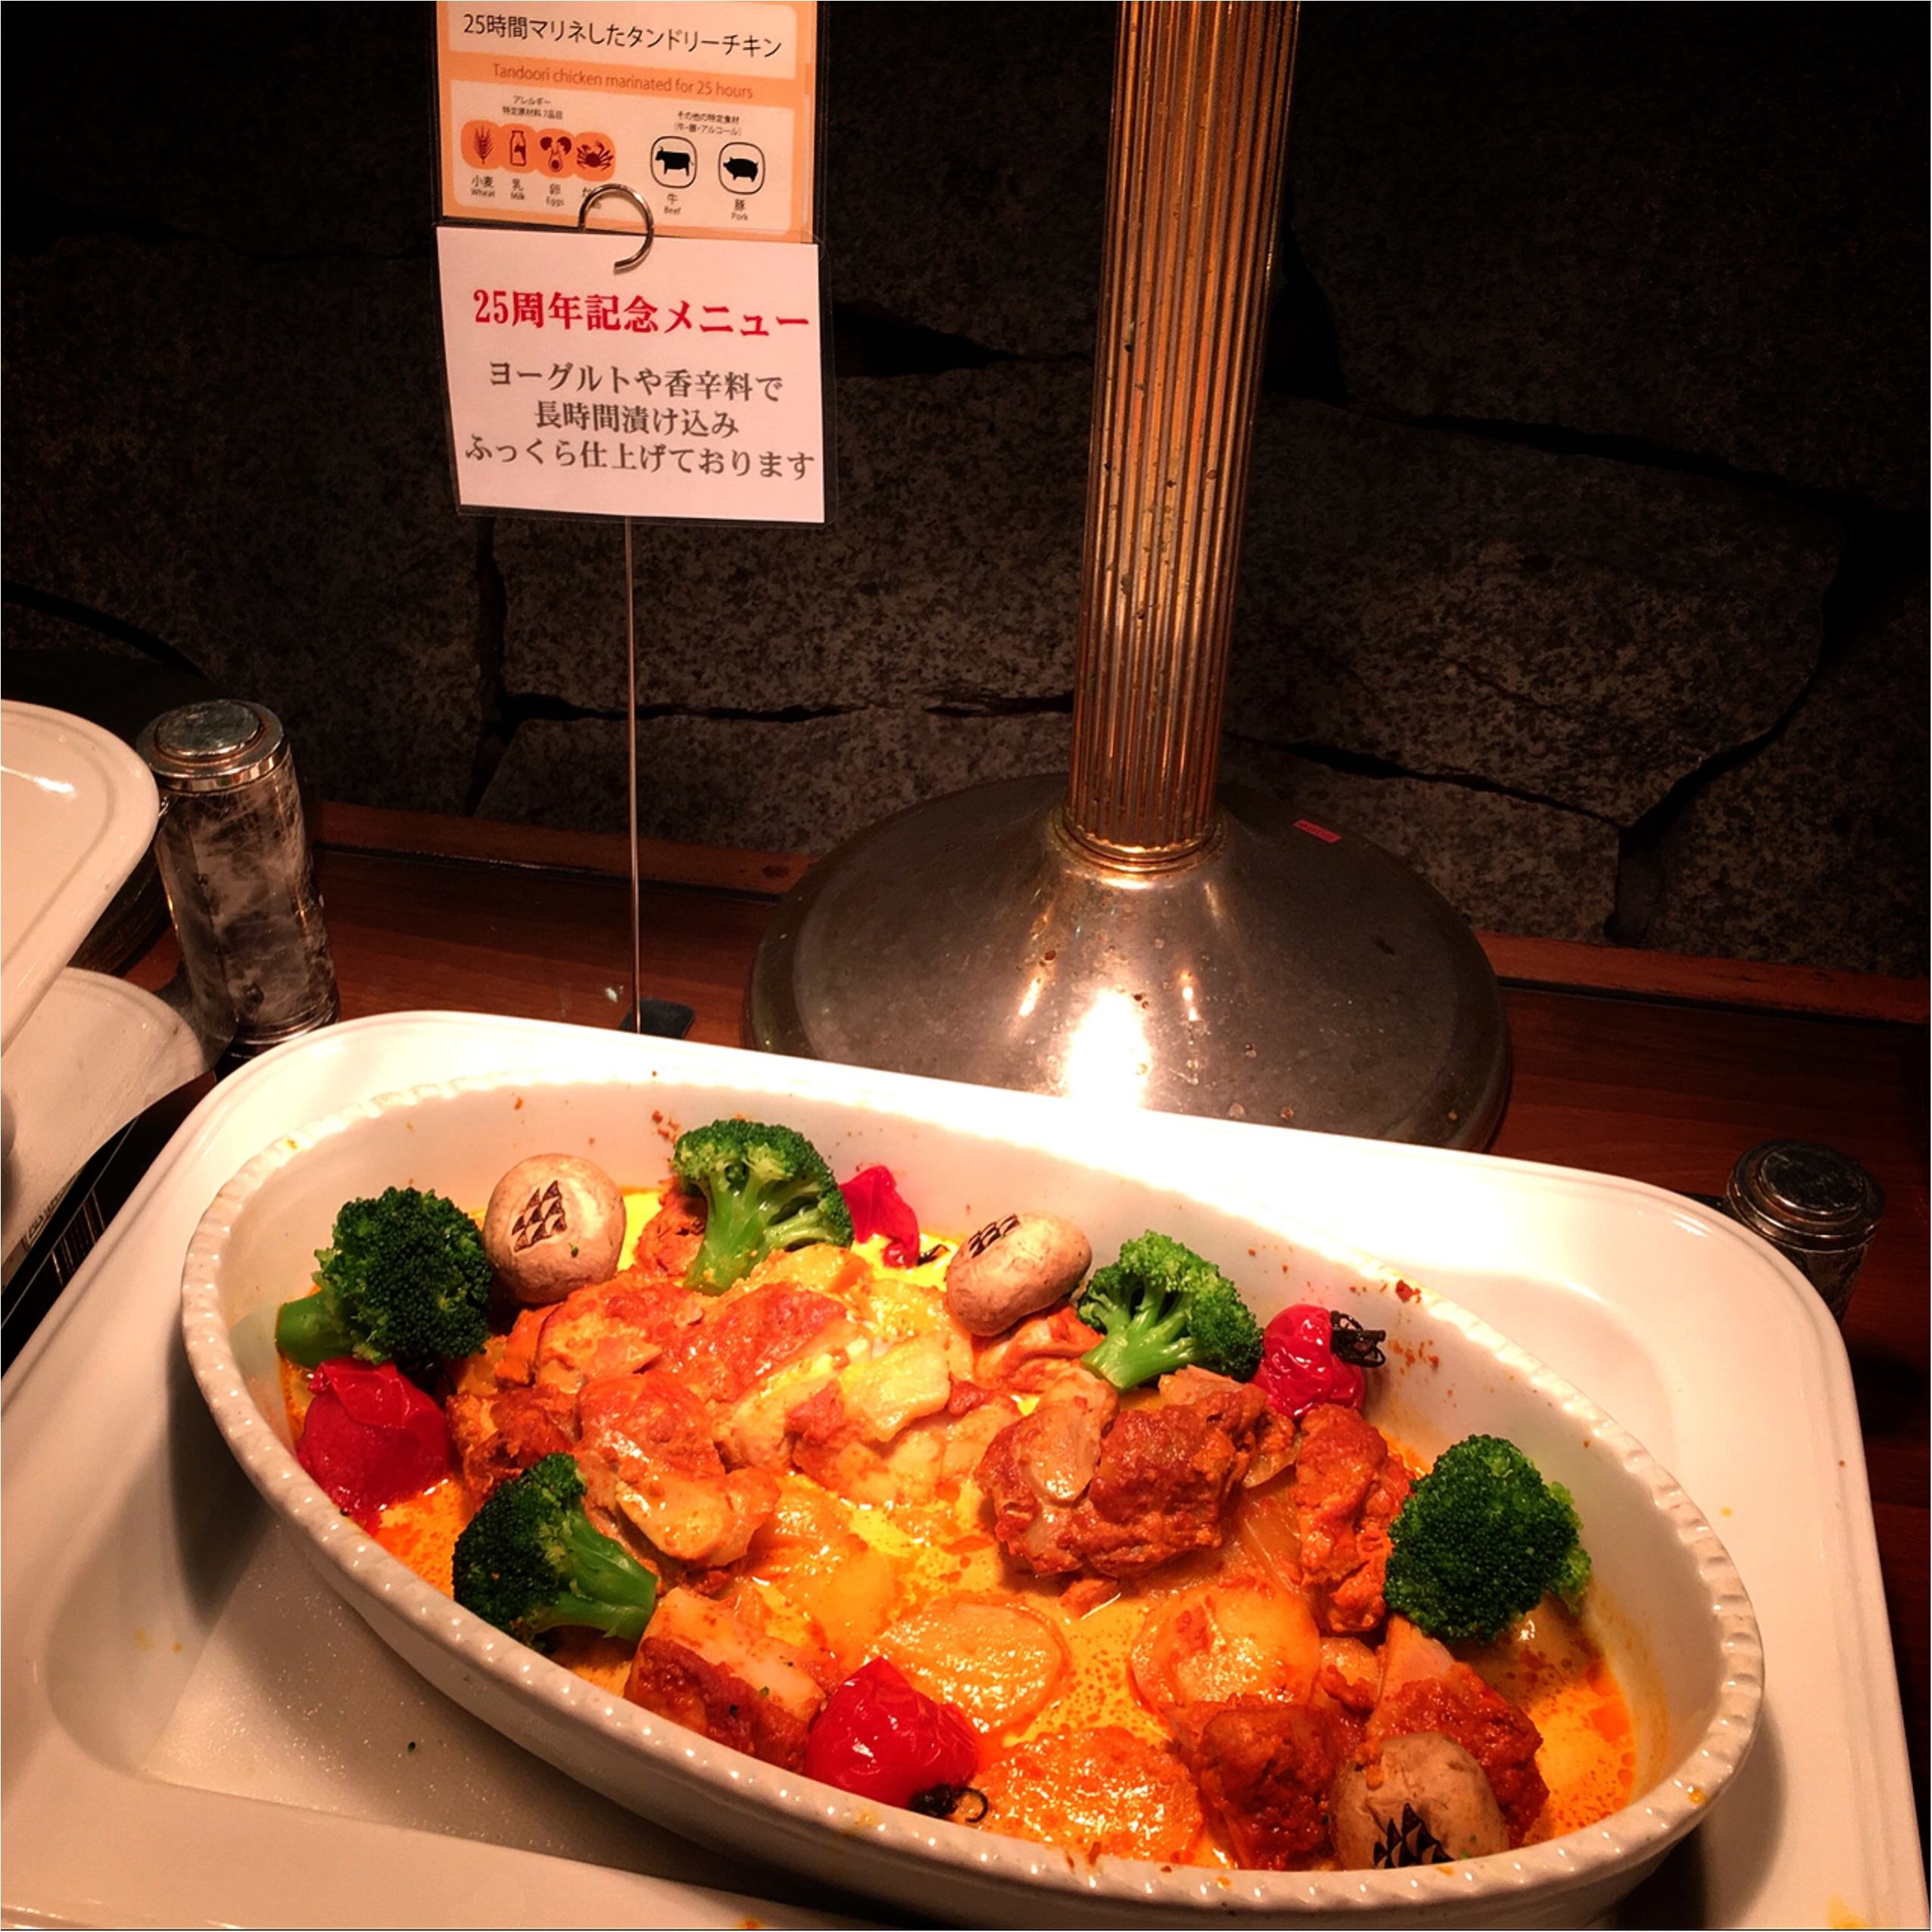 【DINNER】いまお得なディナーはココ!第一ホテル東京シーフォートへ行ってきました☆_5